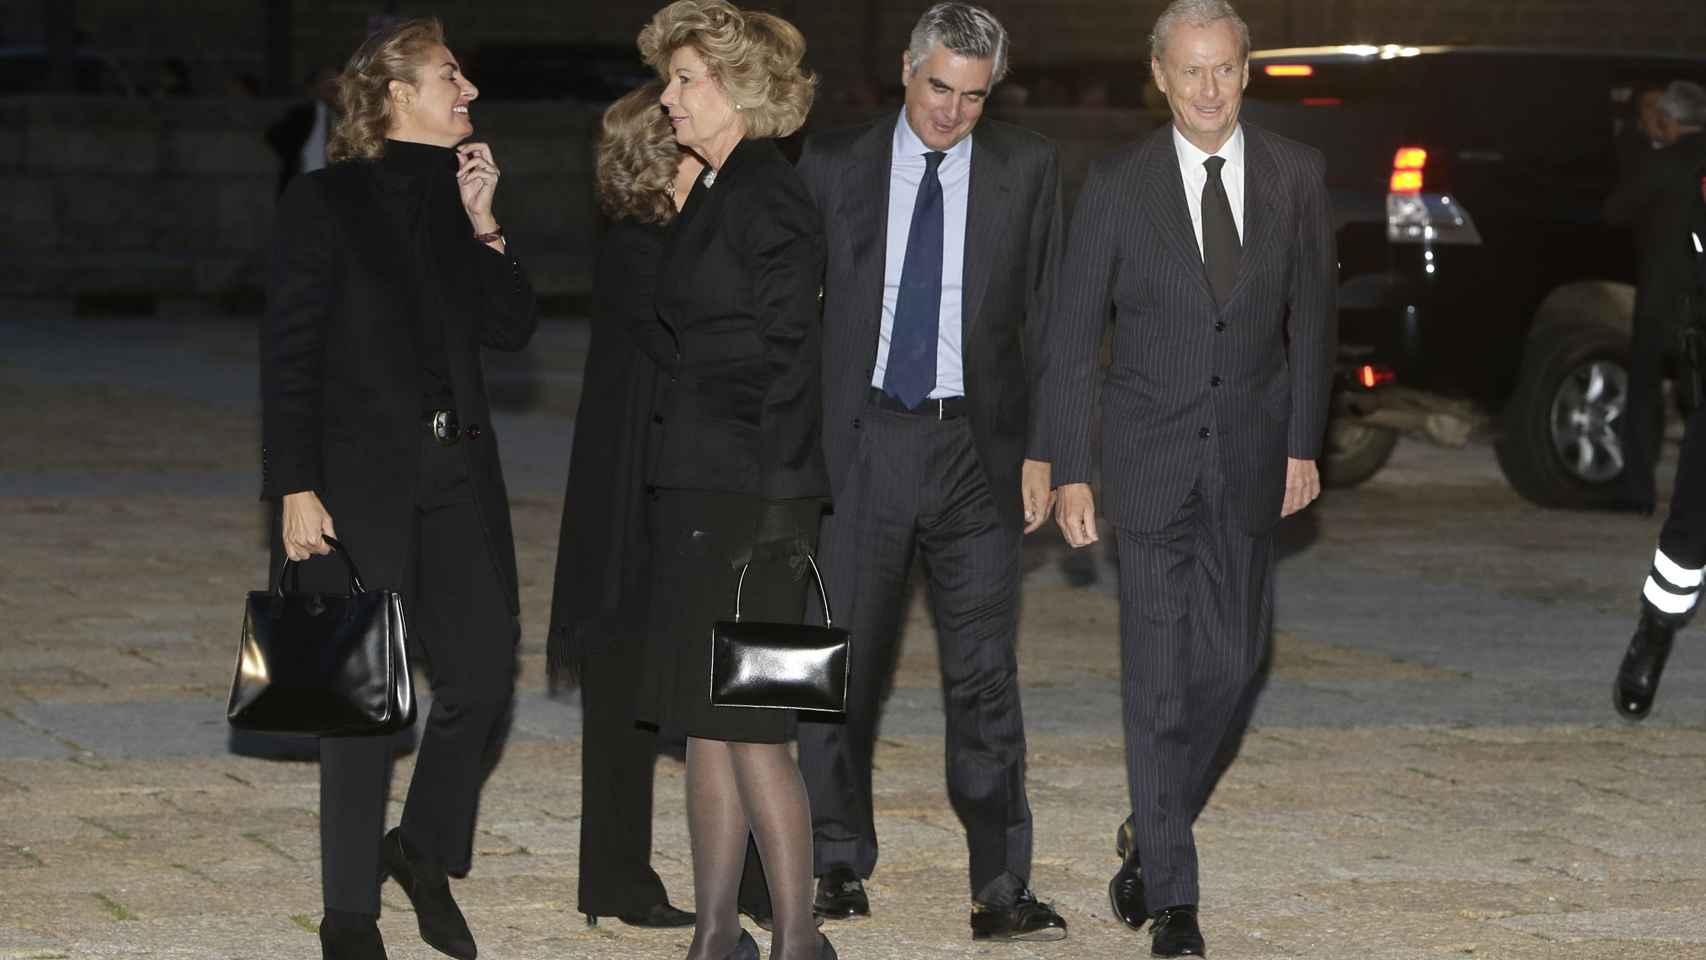 Pedro Morenés y su mujer Goretti Escauriaza Barreiro